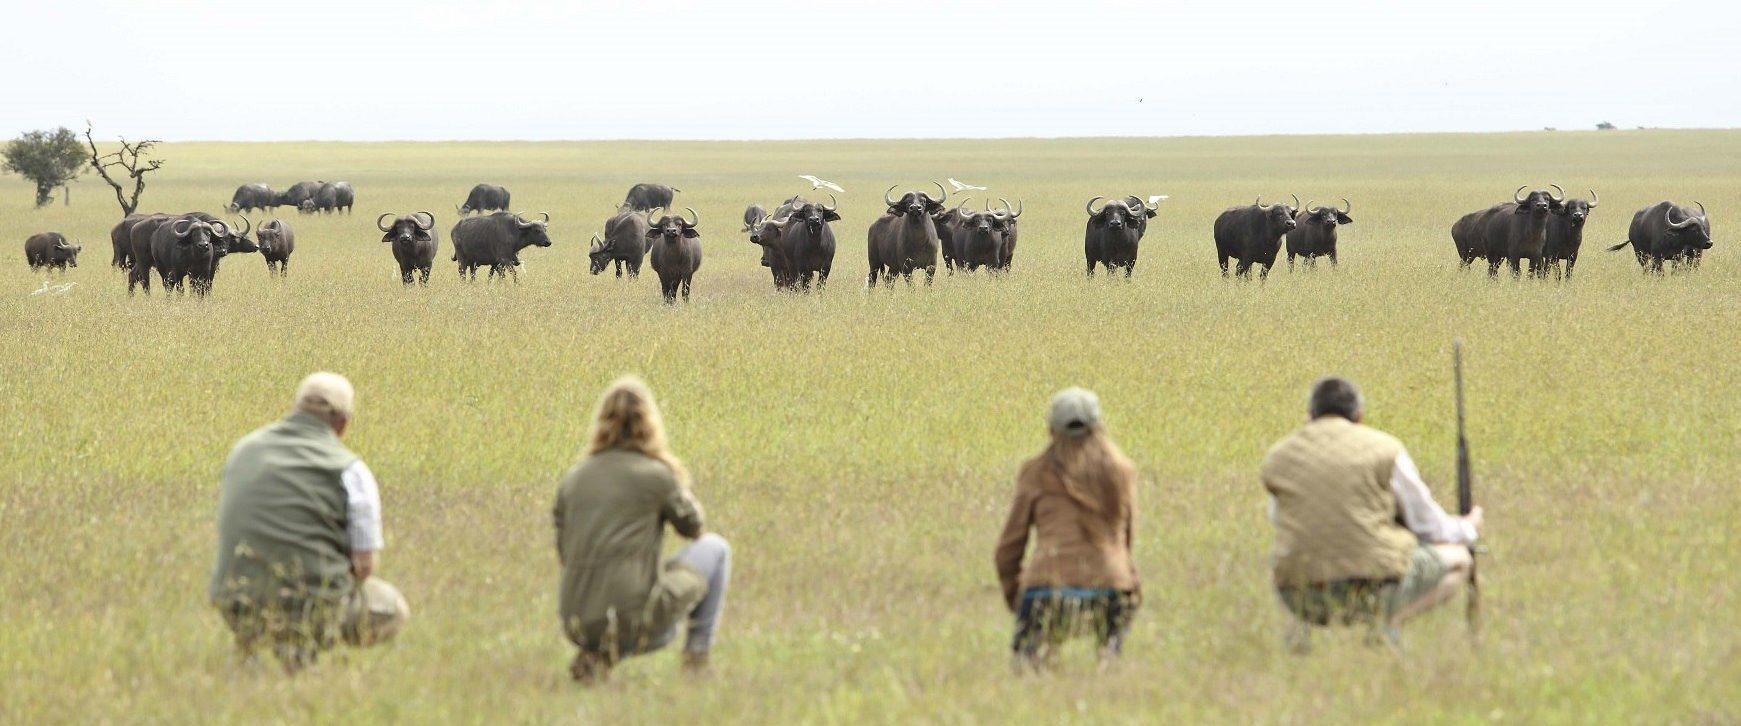 OPBC-walking-safari-animals-e1521625046135